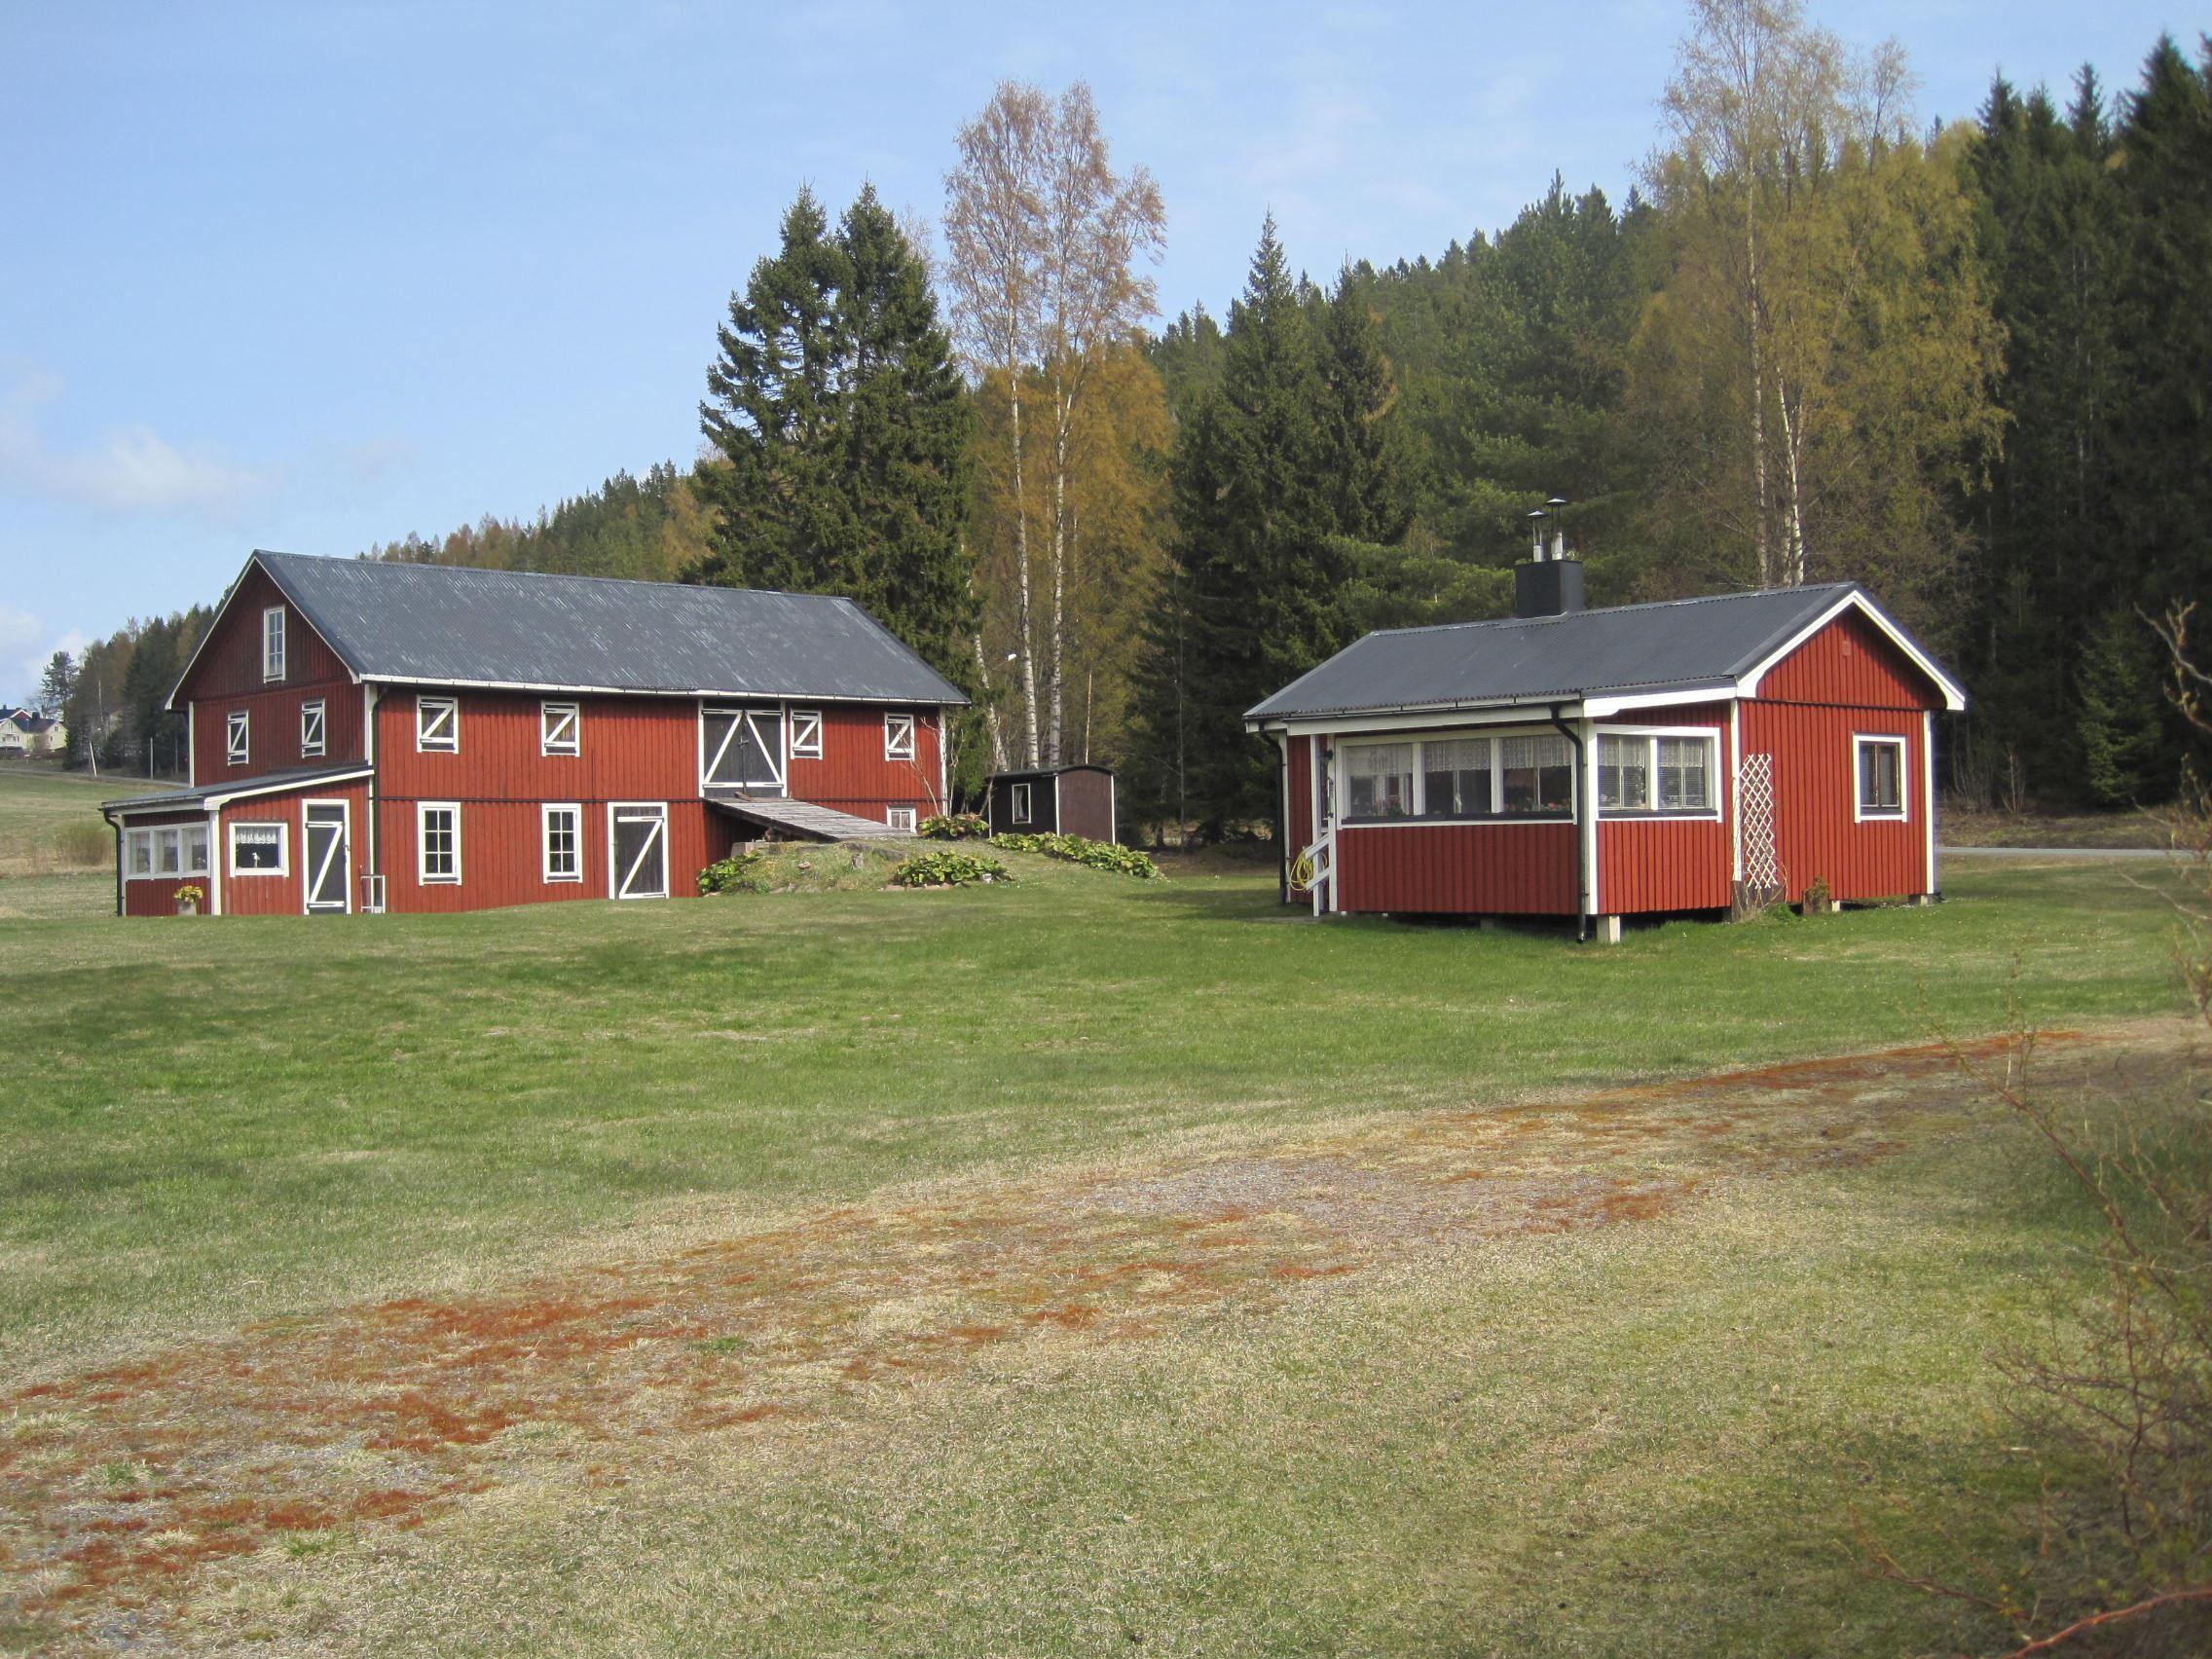 S2508 Måviken, Mjällom